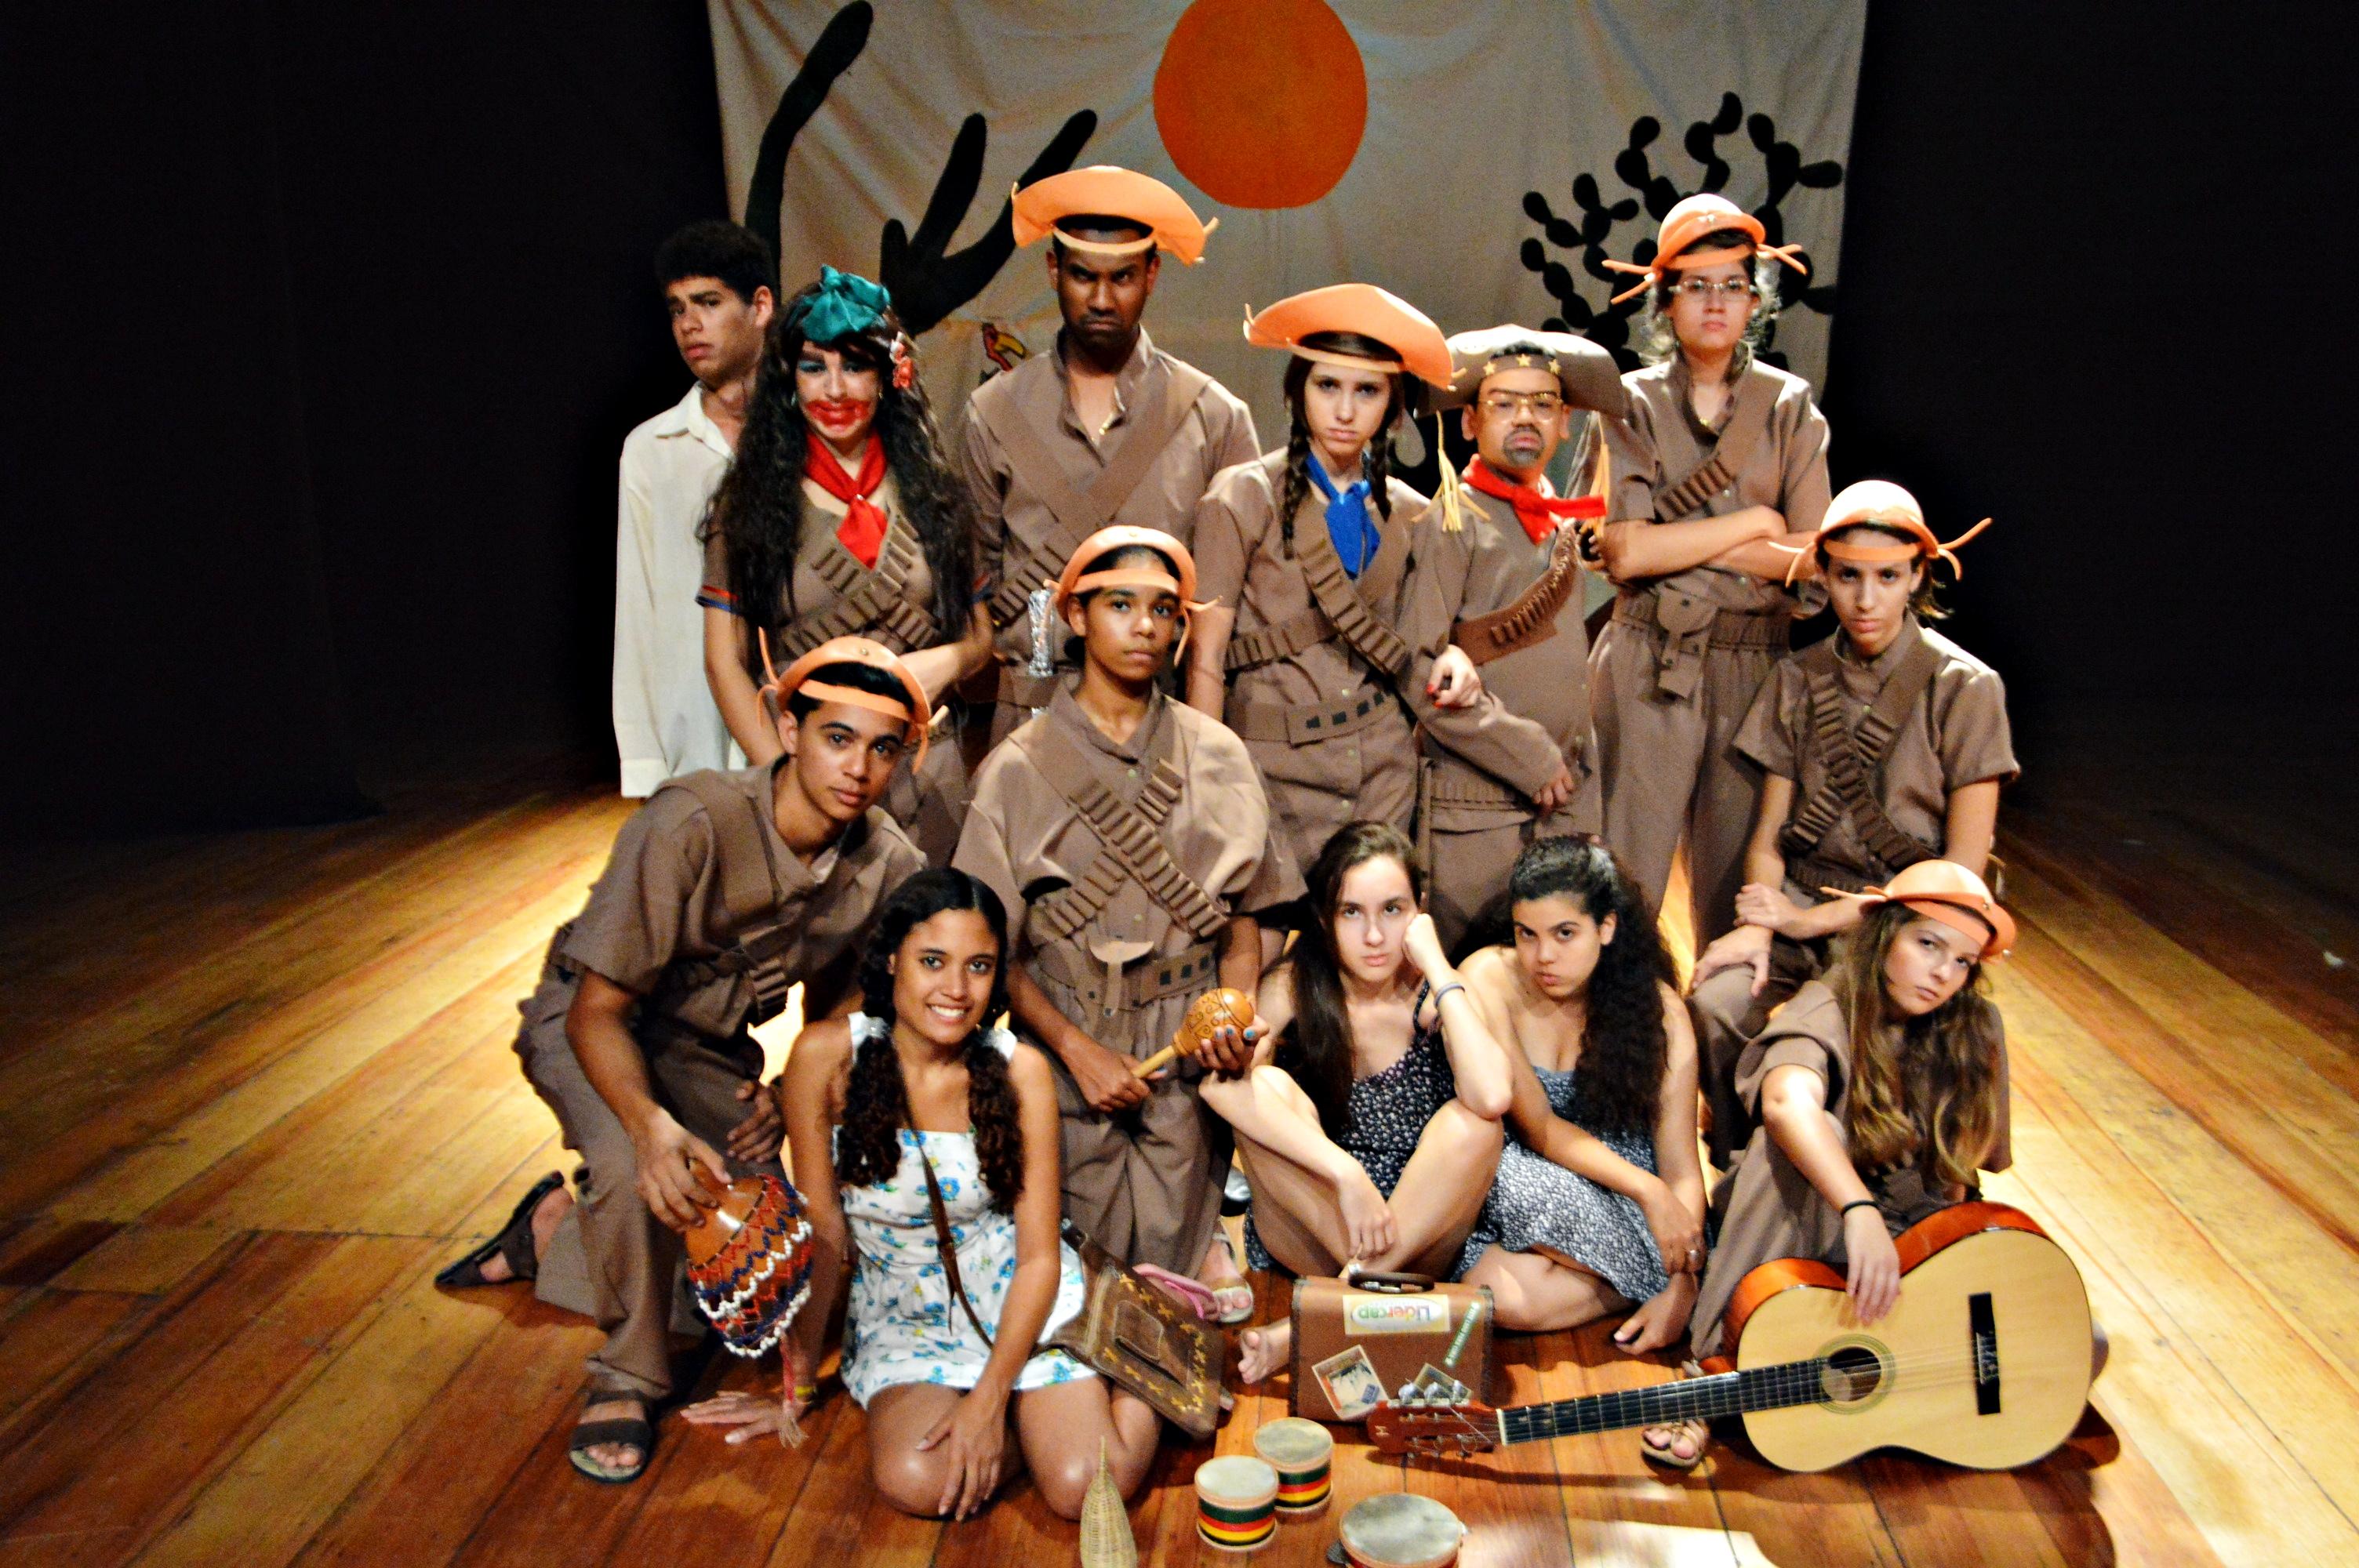 curso de teatro em brasília